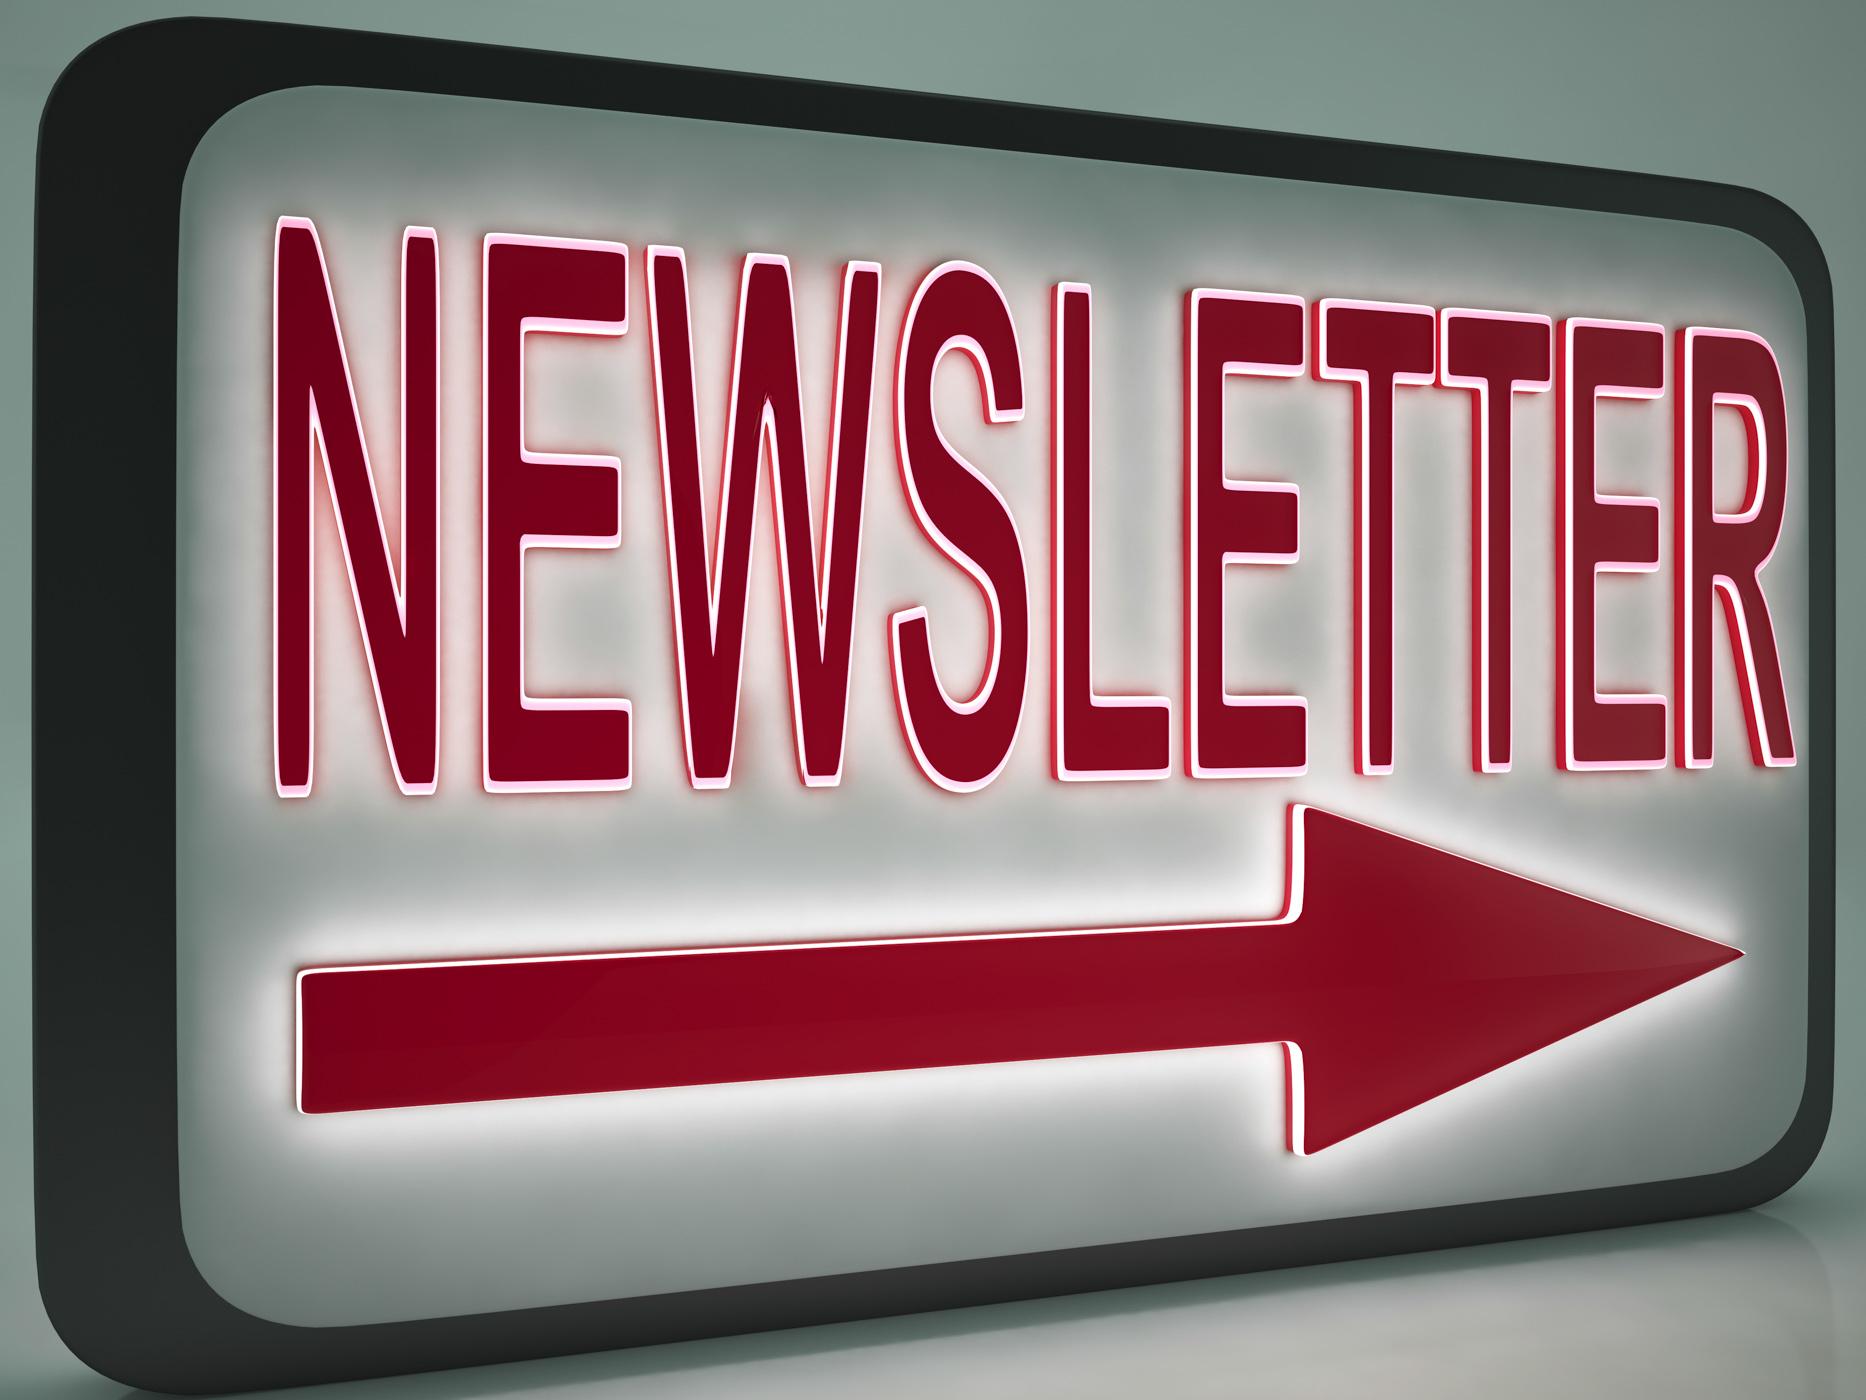 Newsletter sign shows online news photo